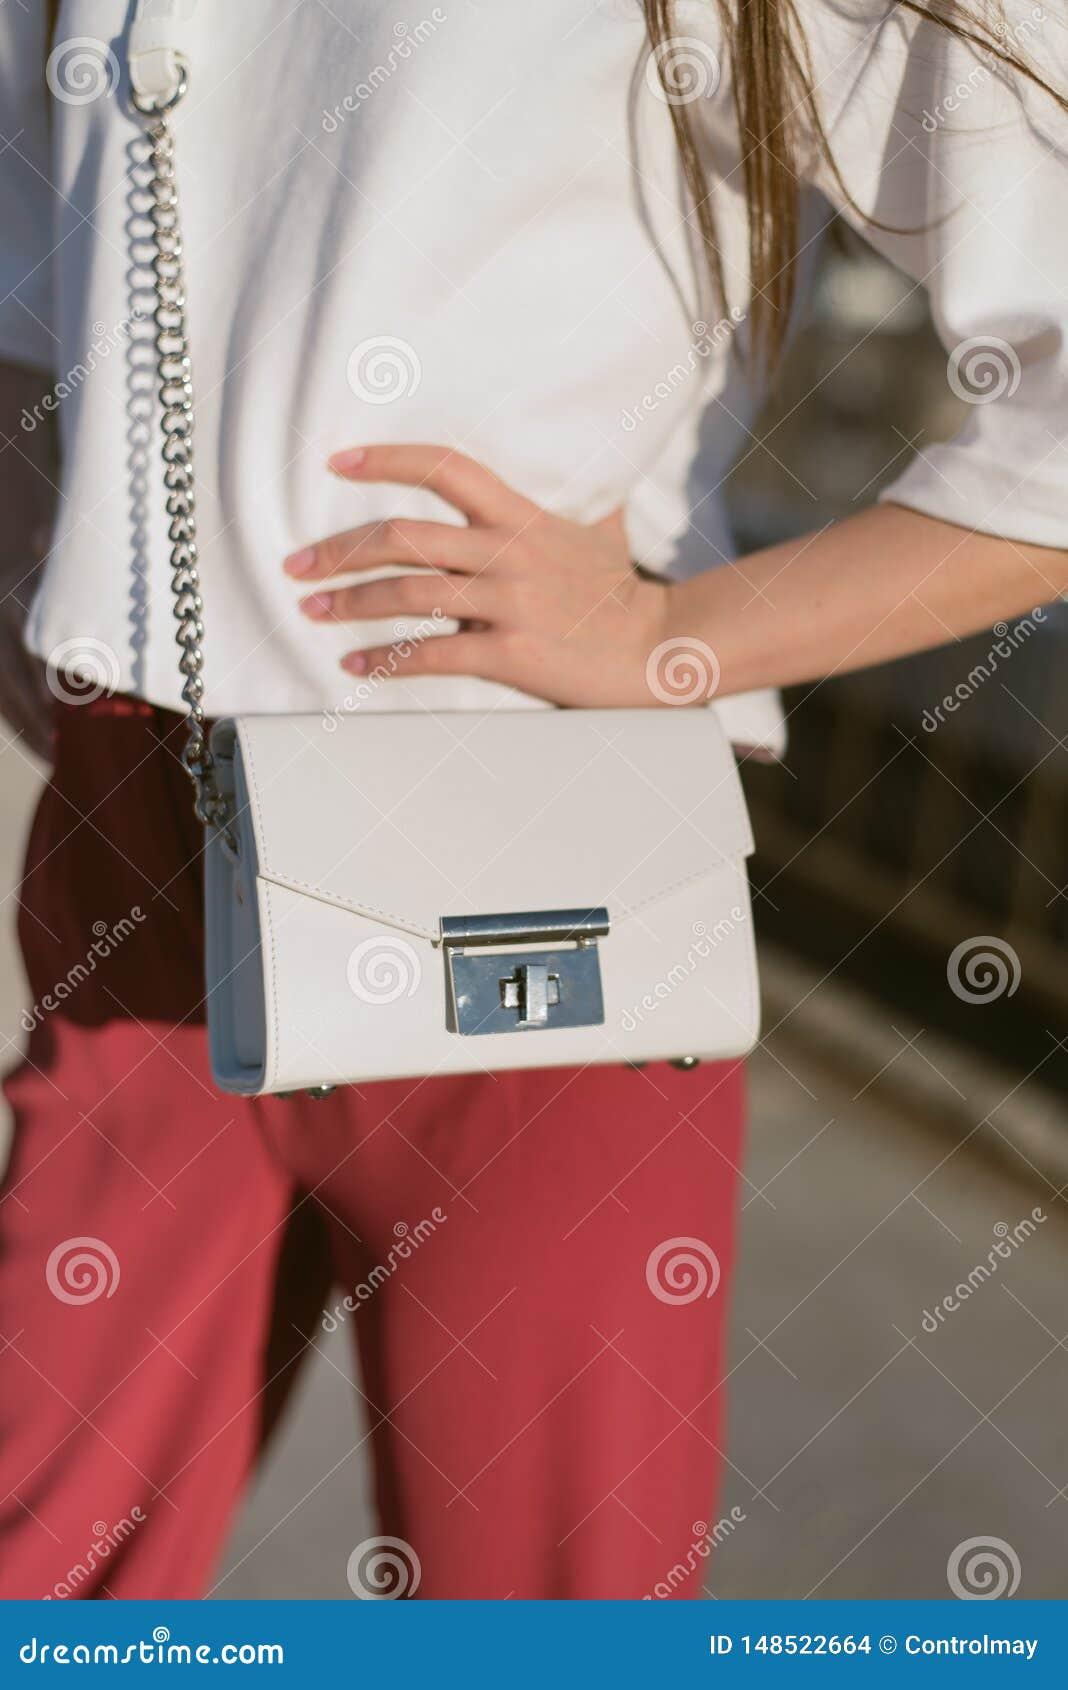 сумка на девушке